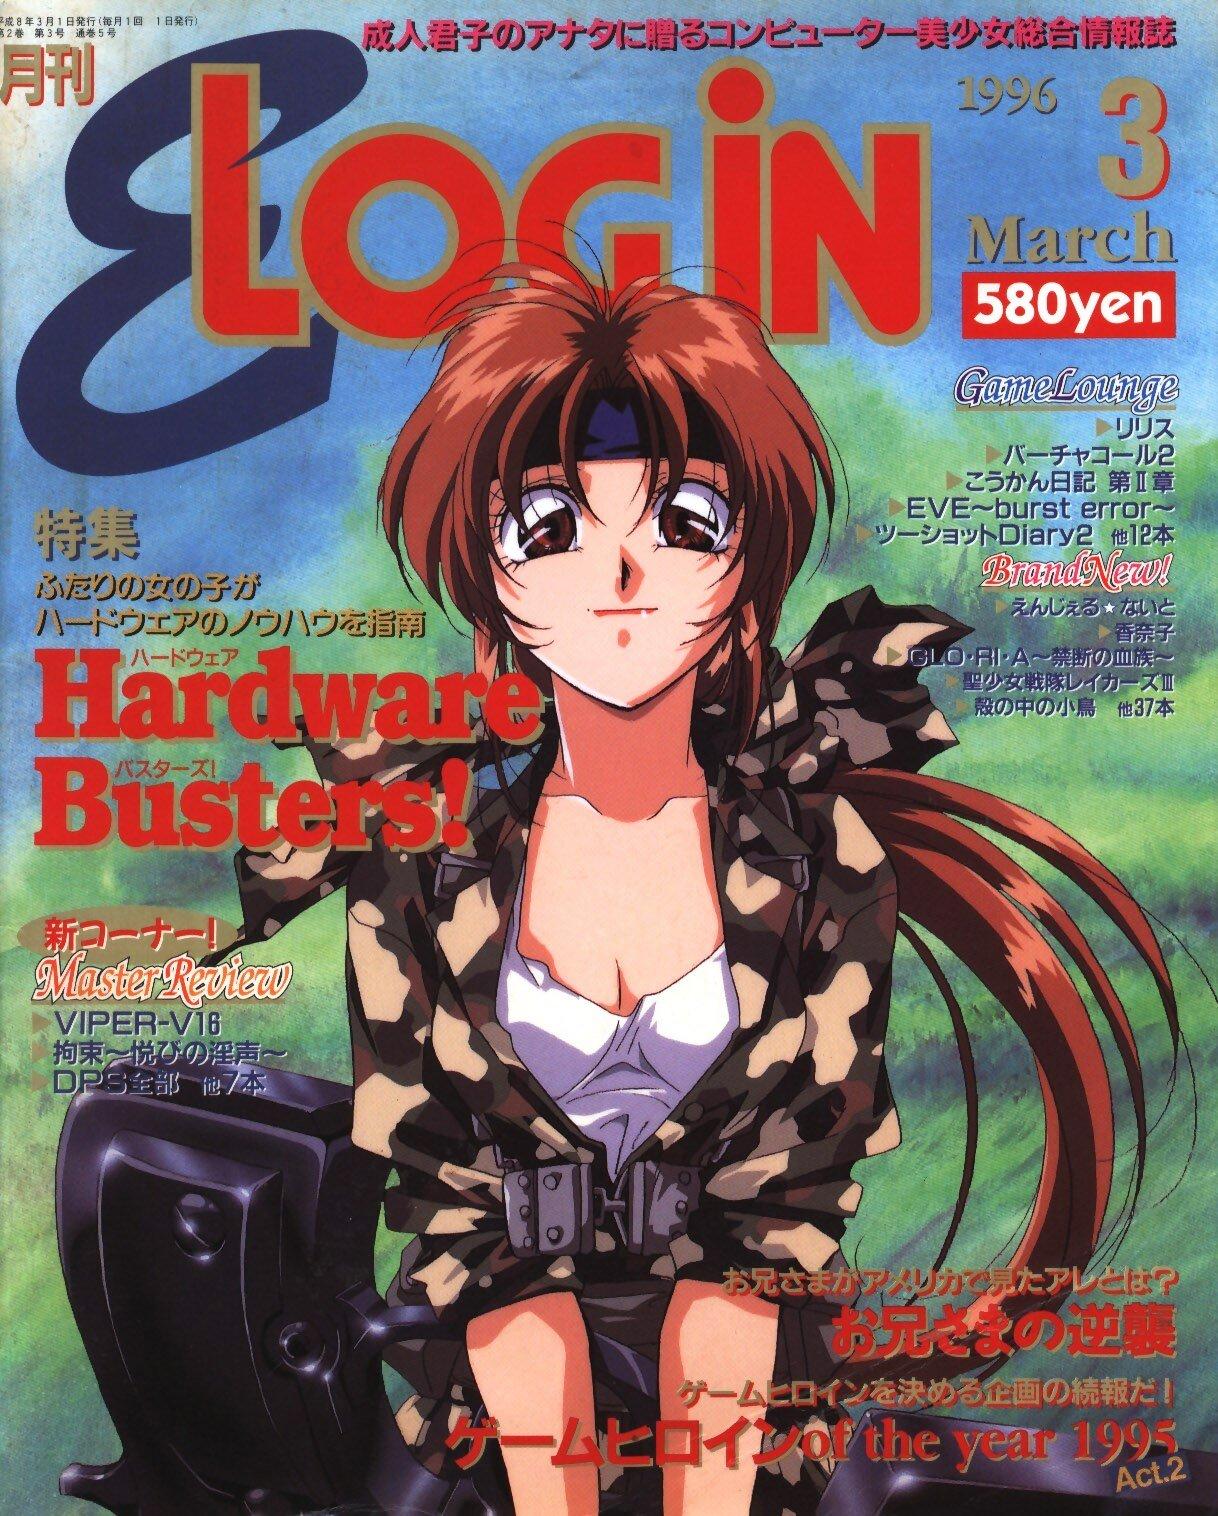 E-Login Issue 005 (March 1996)